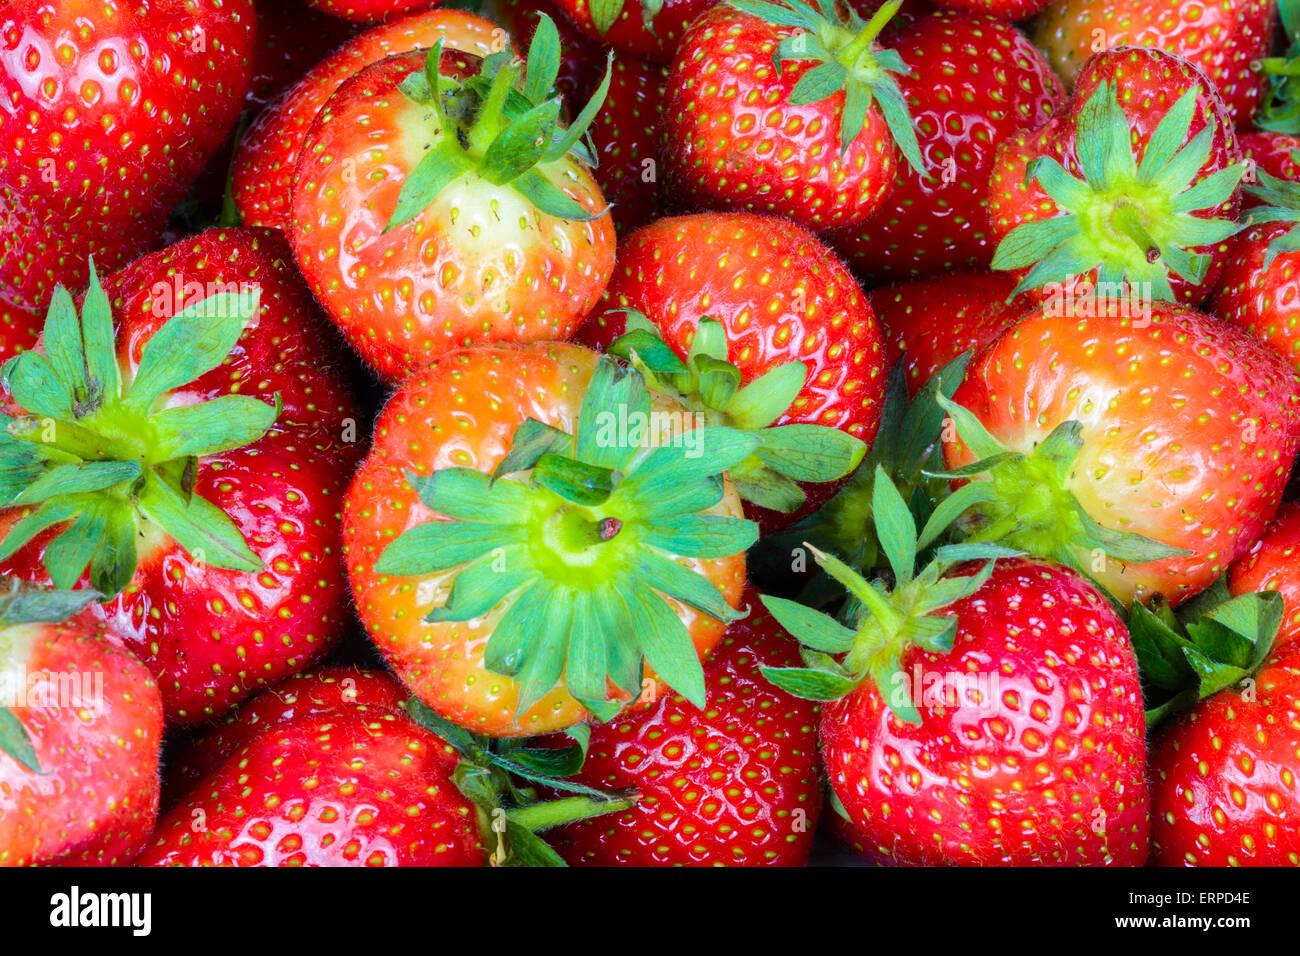 Mixed sizes of ripe English strawberries. - Stock Image